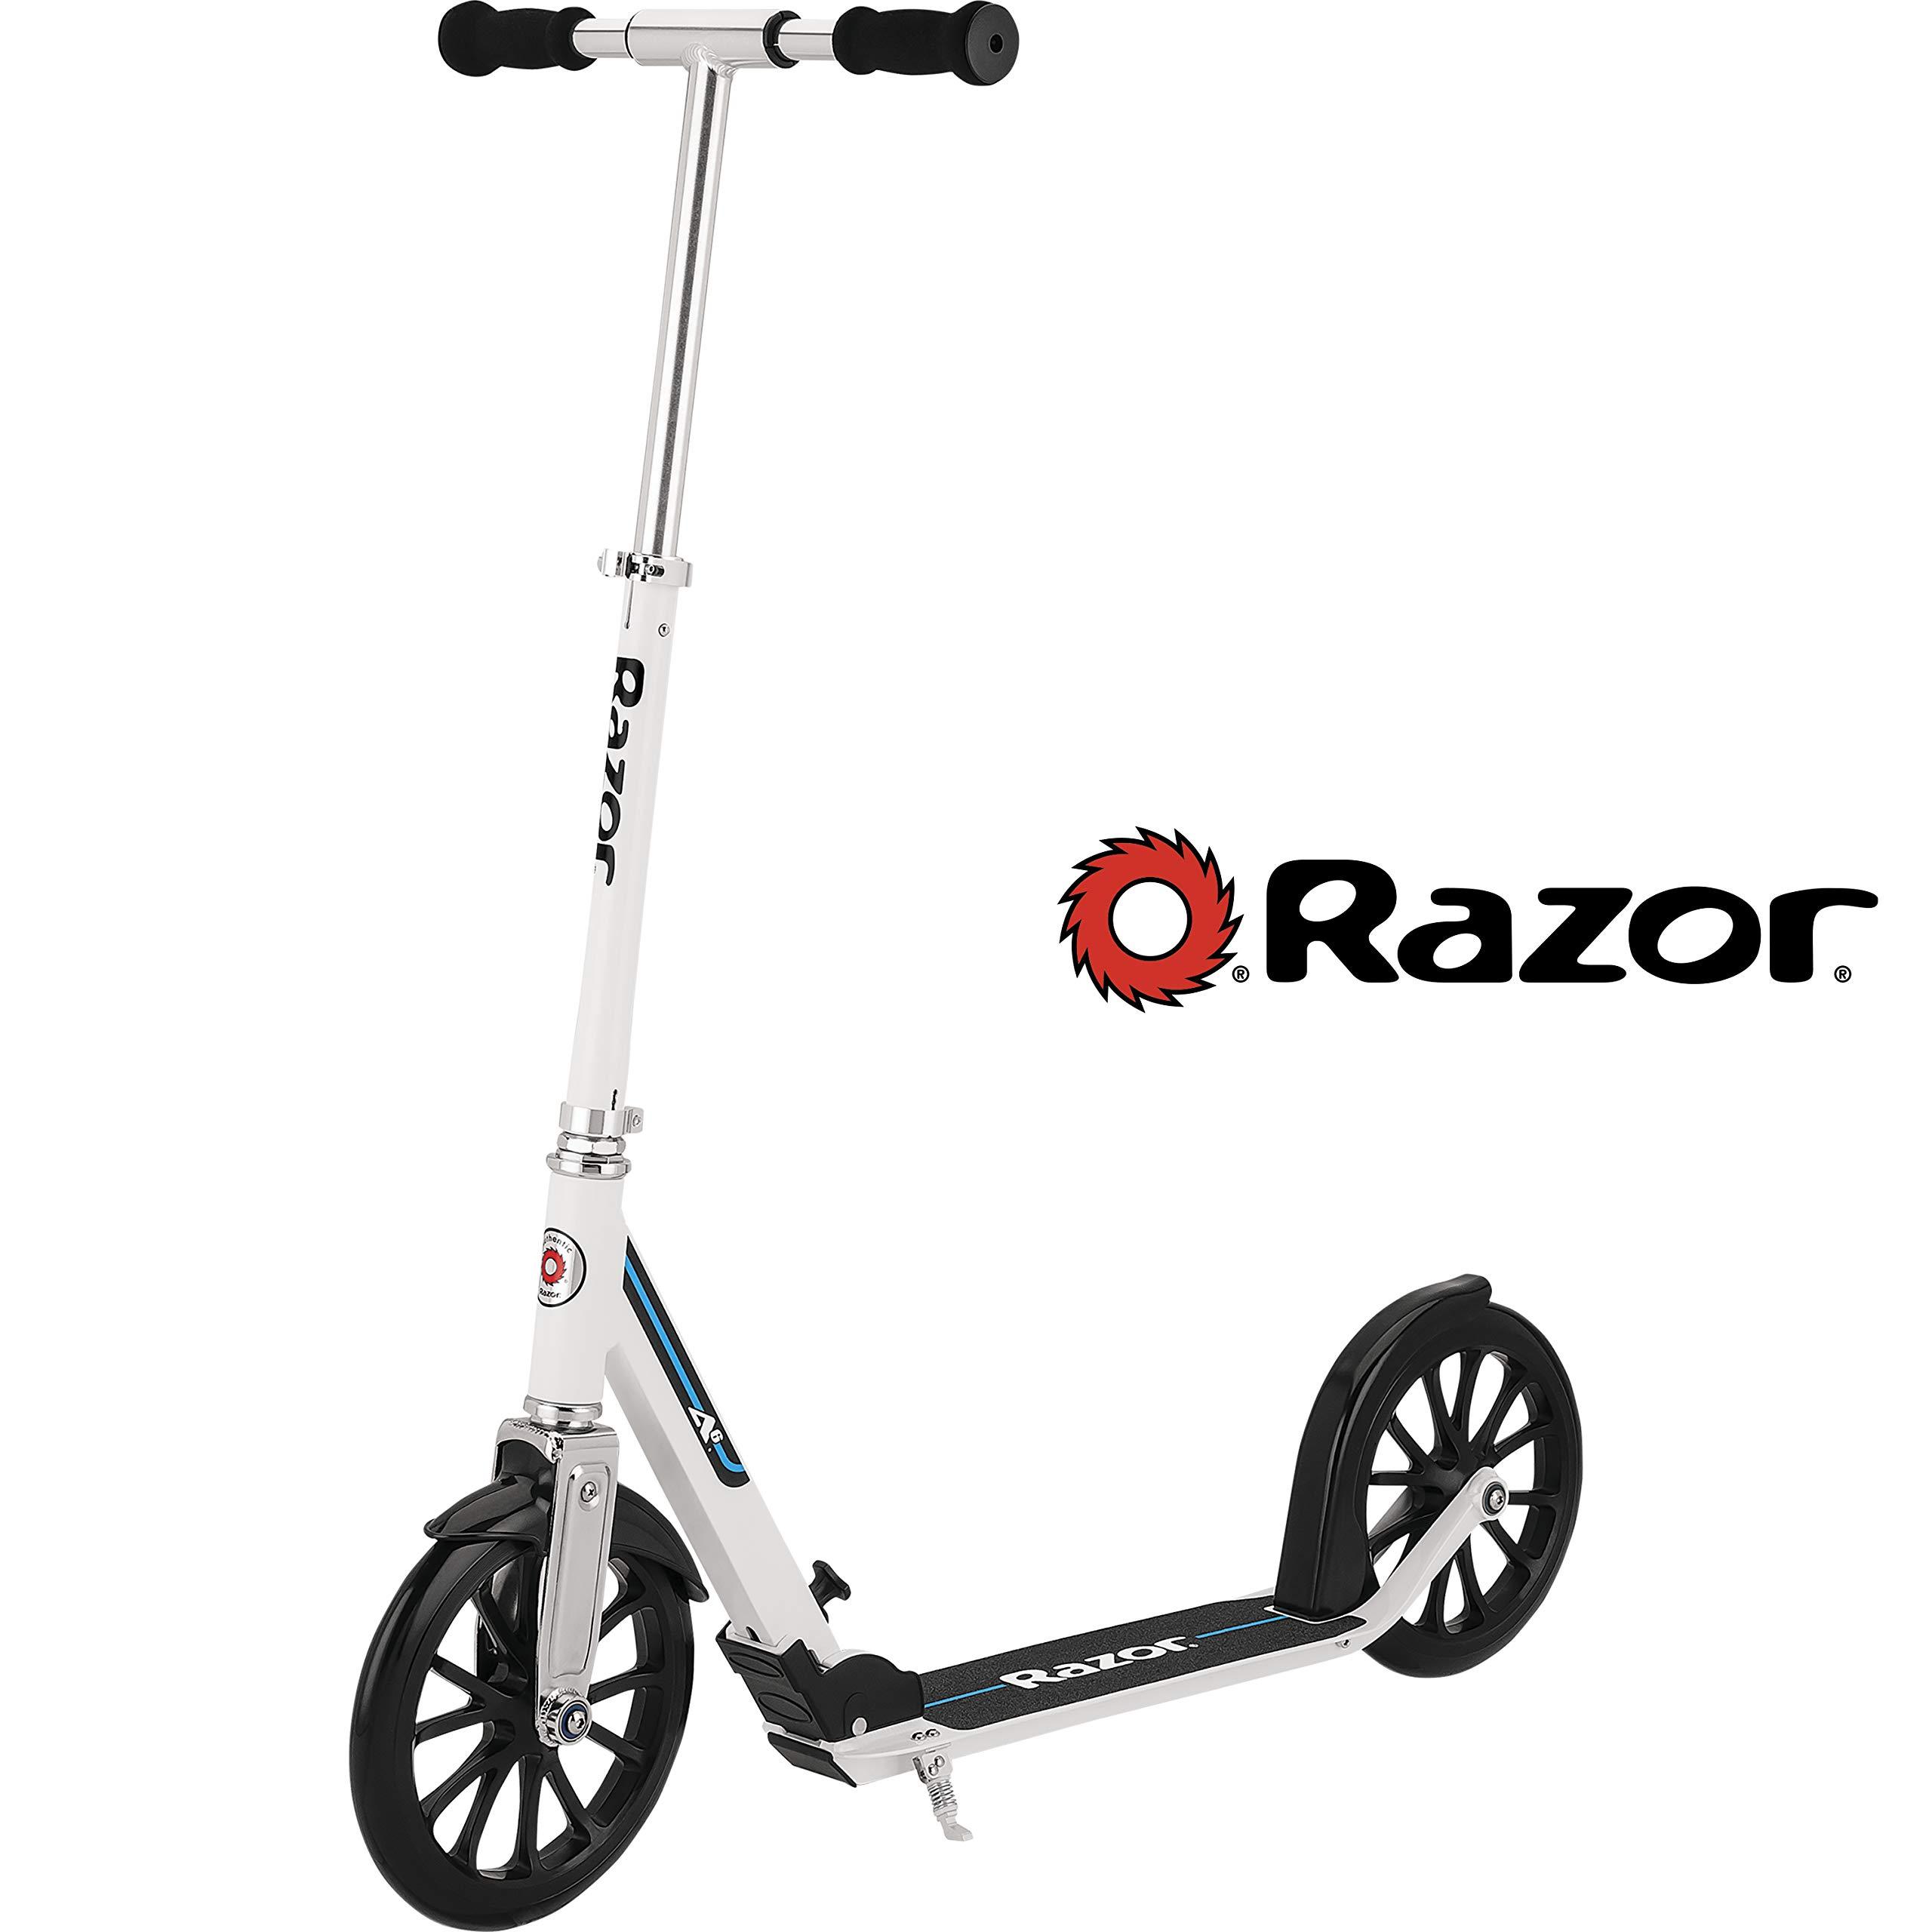 Razor A6 Kick Scooter - White by Razor